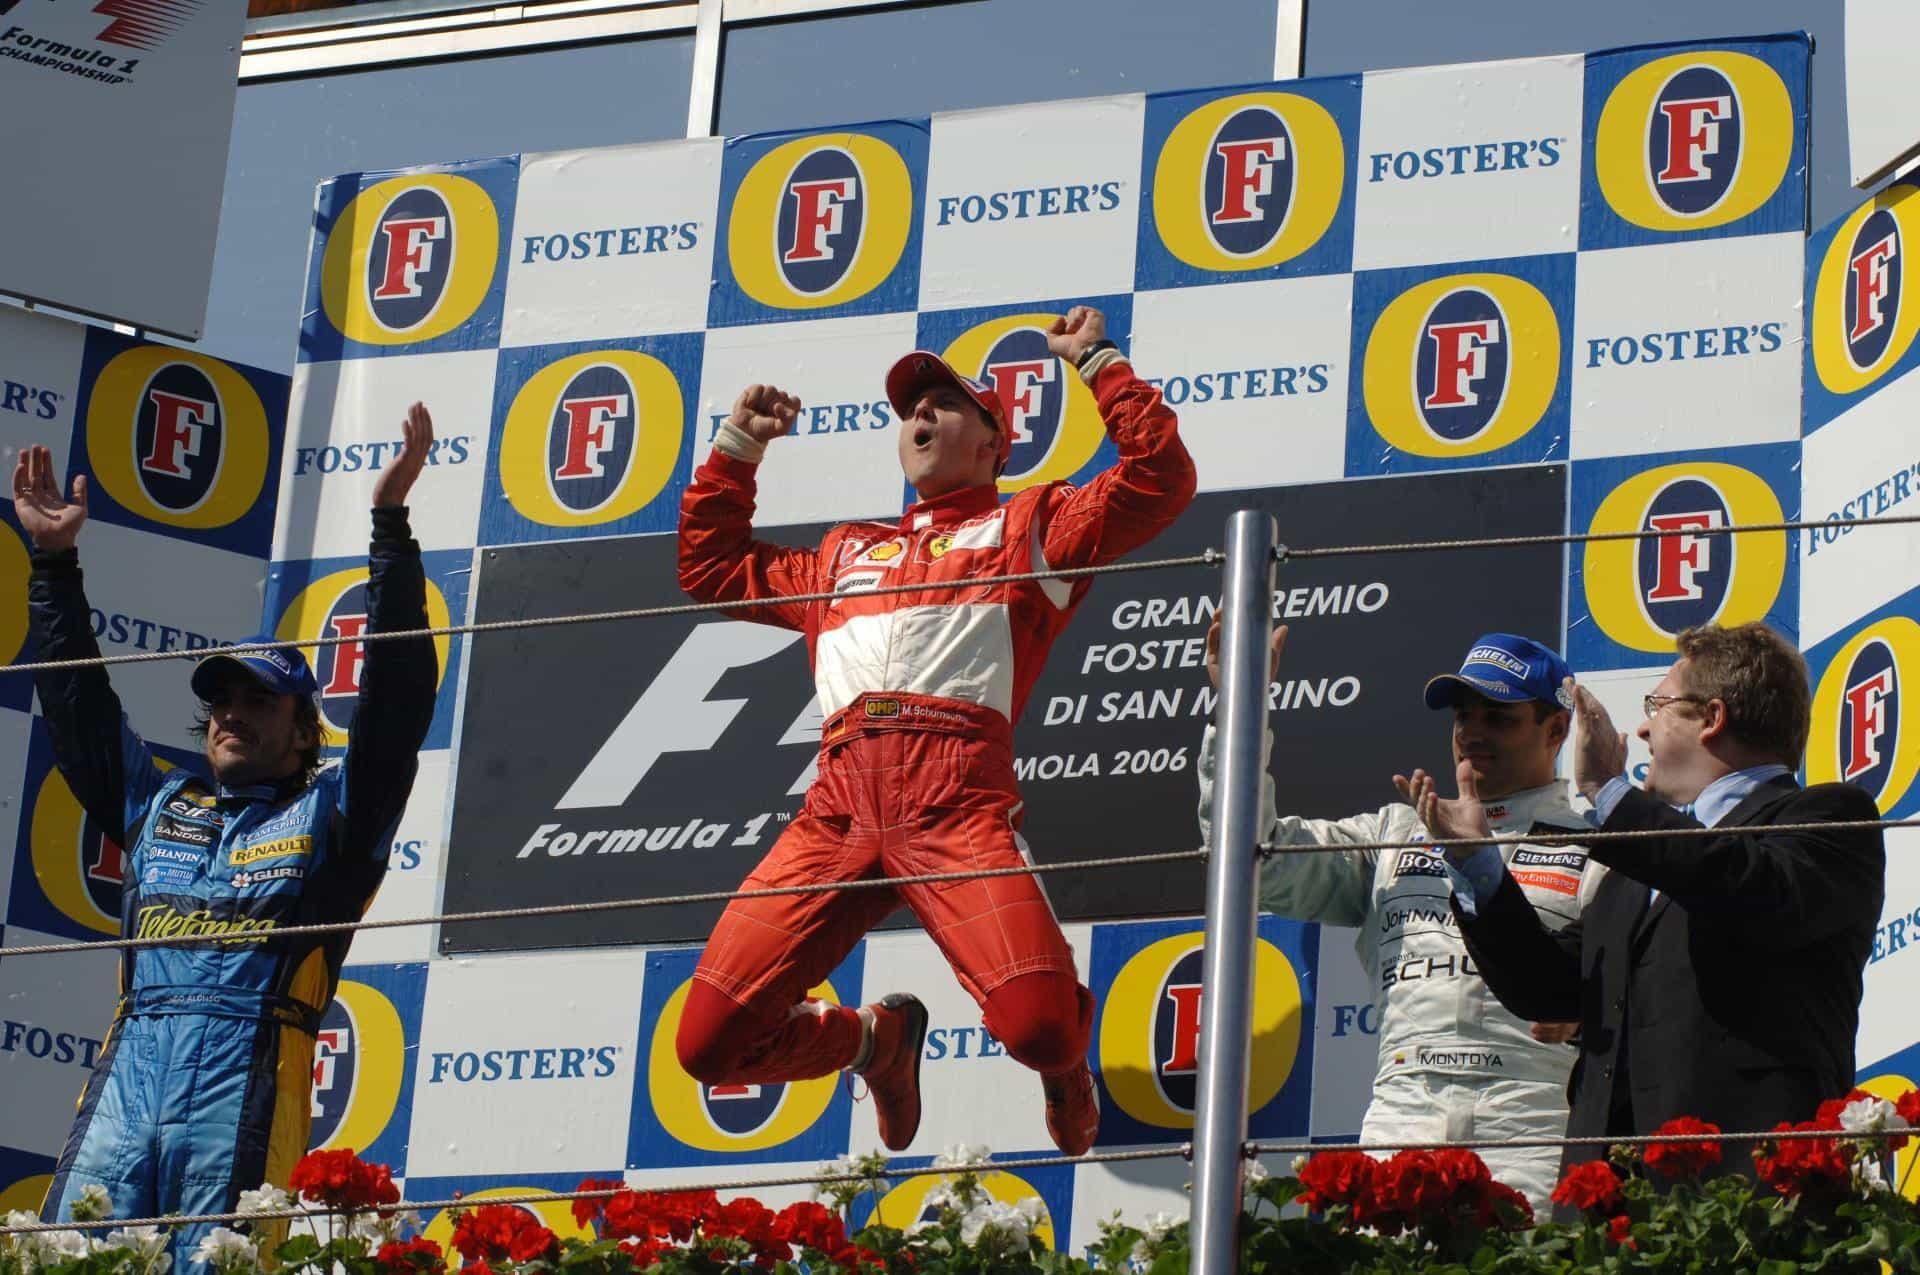 San Marino Imola F1 2006 podium Foto Ferrari